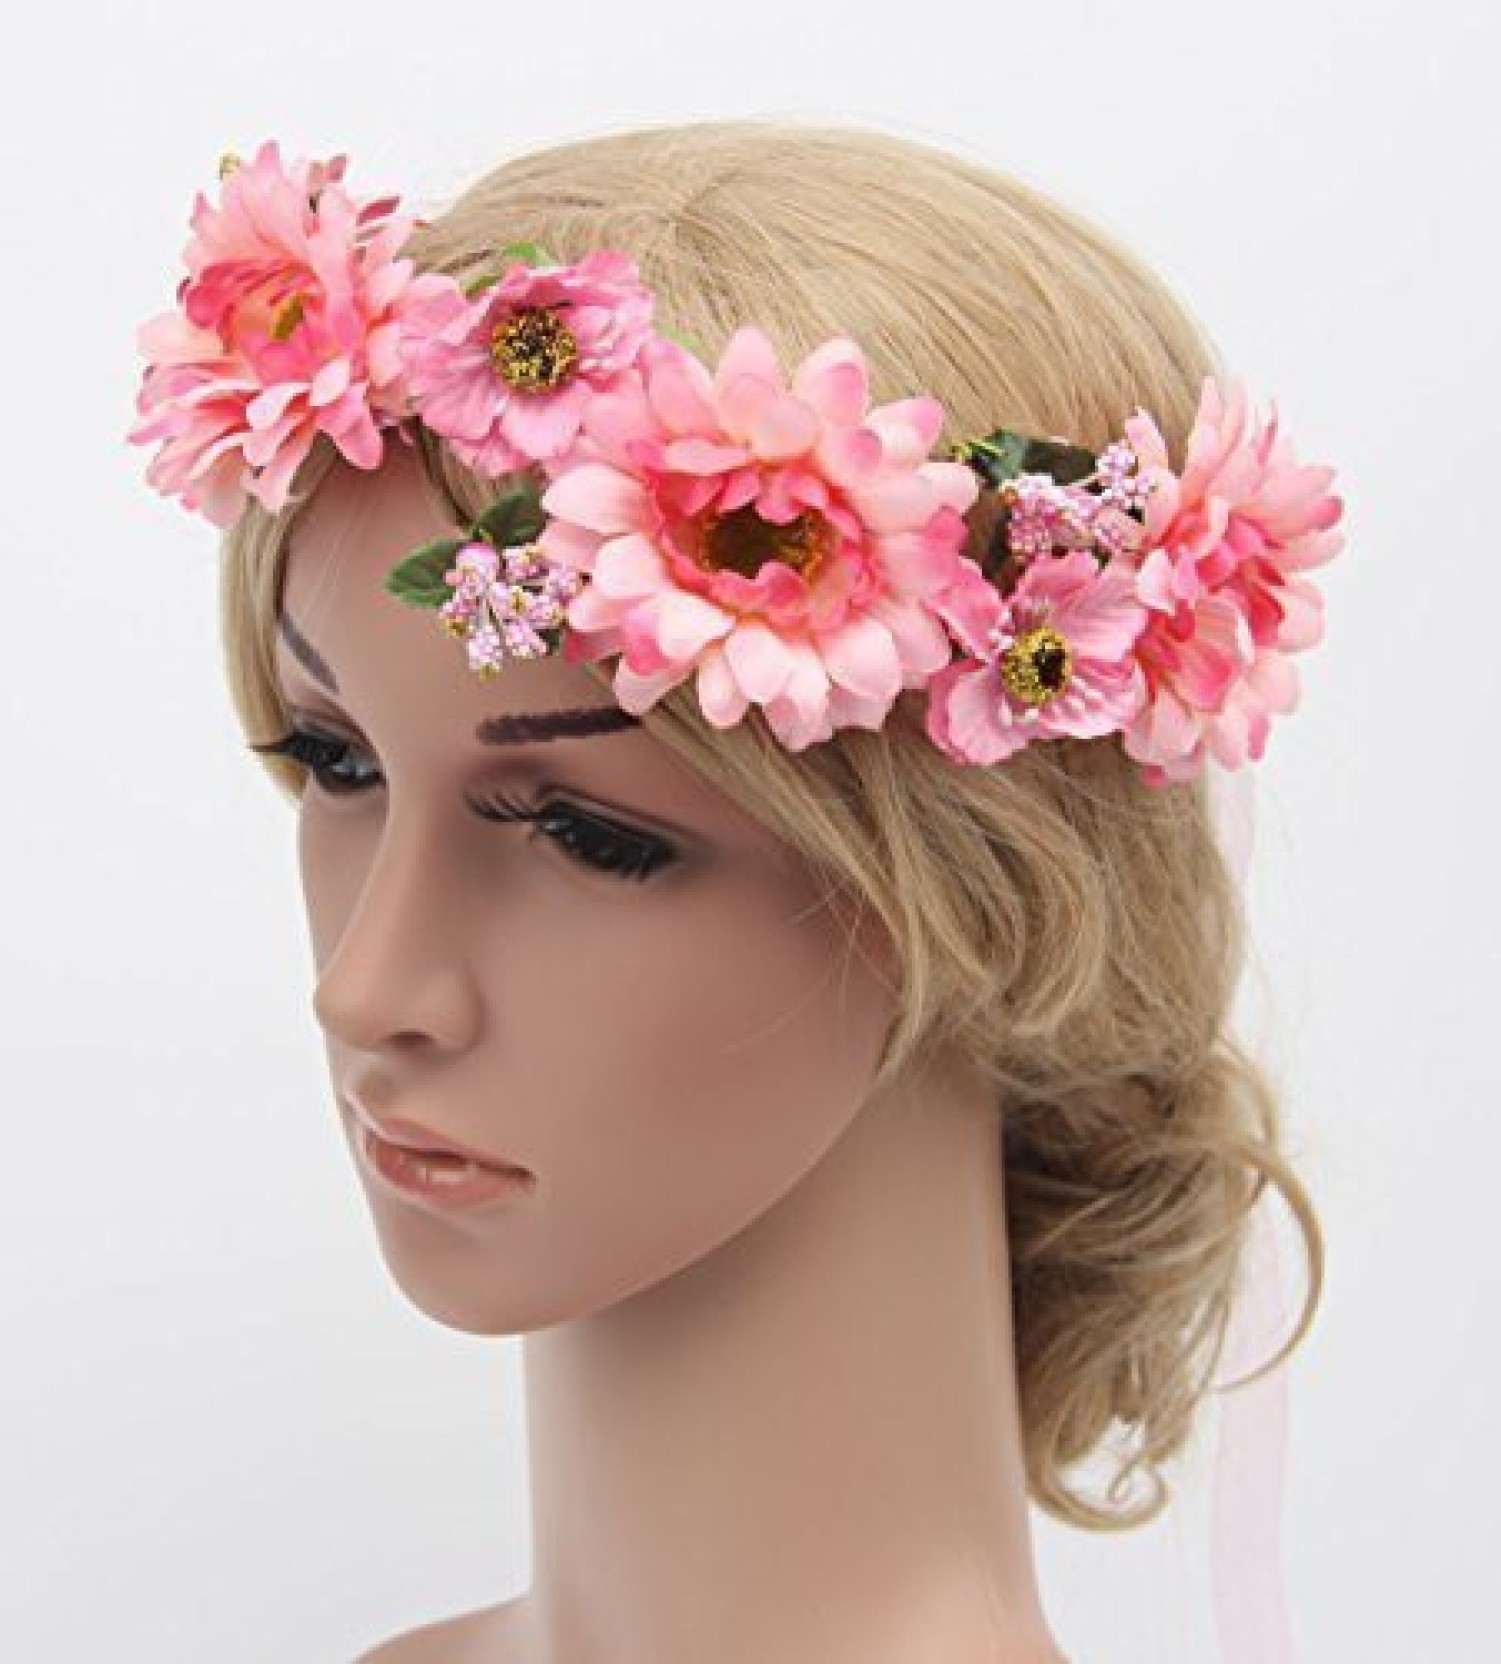 Meiliy Daisy Flower Garland Crown Flower Headband Hair Wreath With